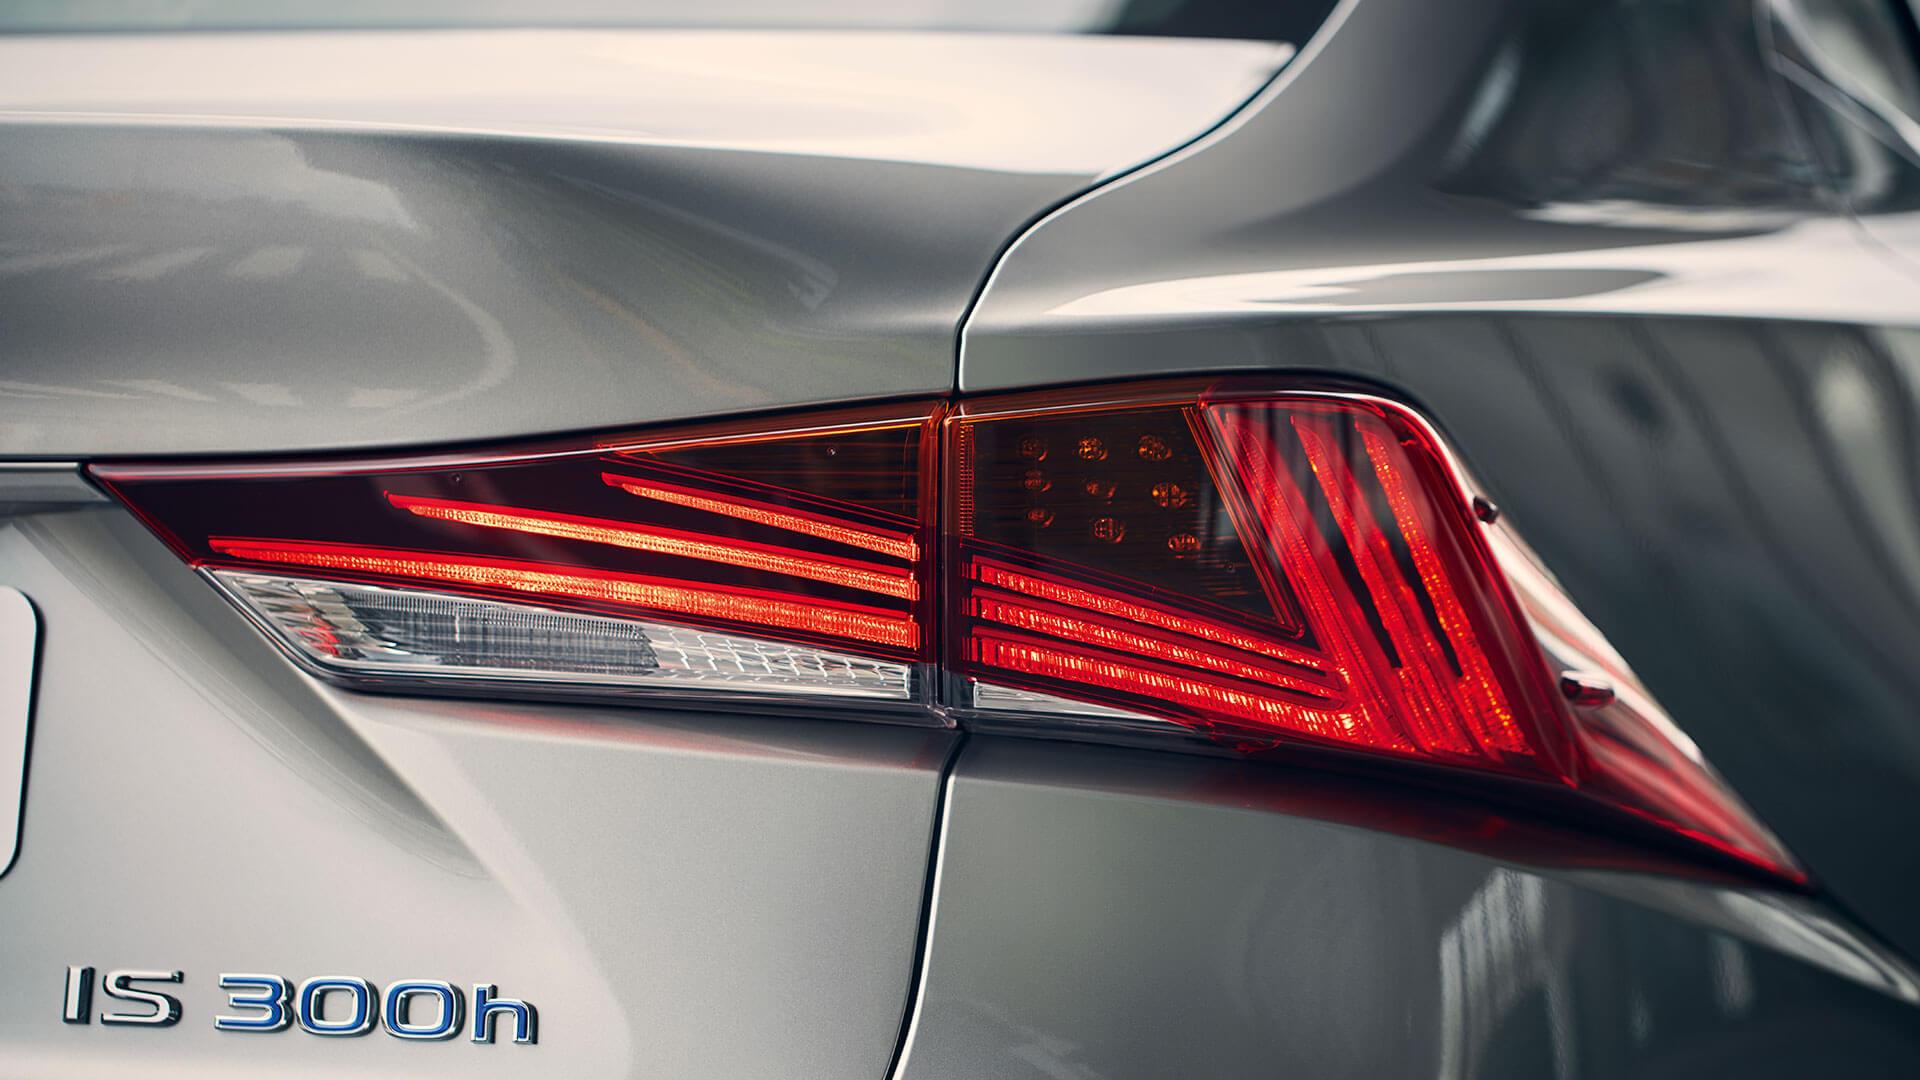 2017 lexus is 300h features led rear lights